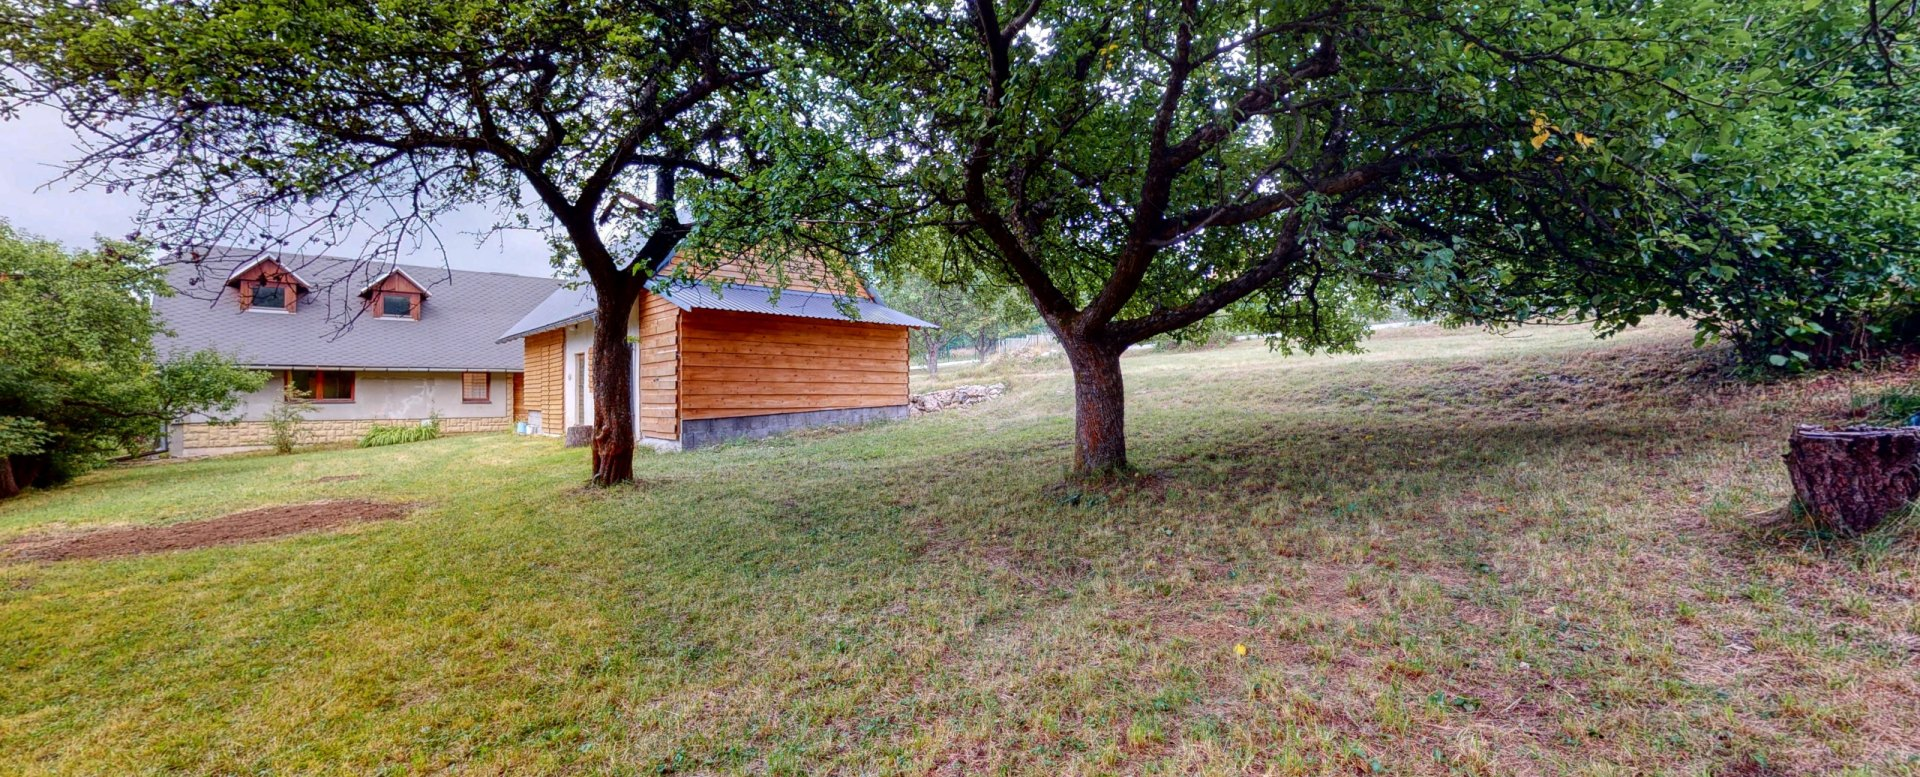 Pohľad na záhradu, hospodársky objekt a dom